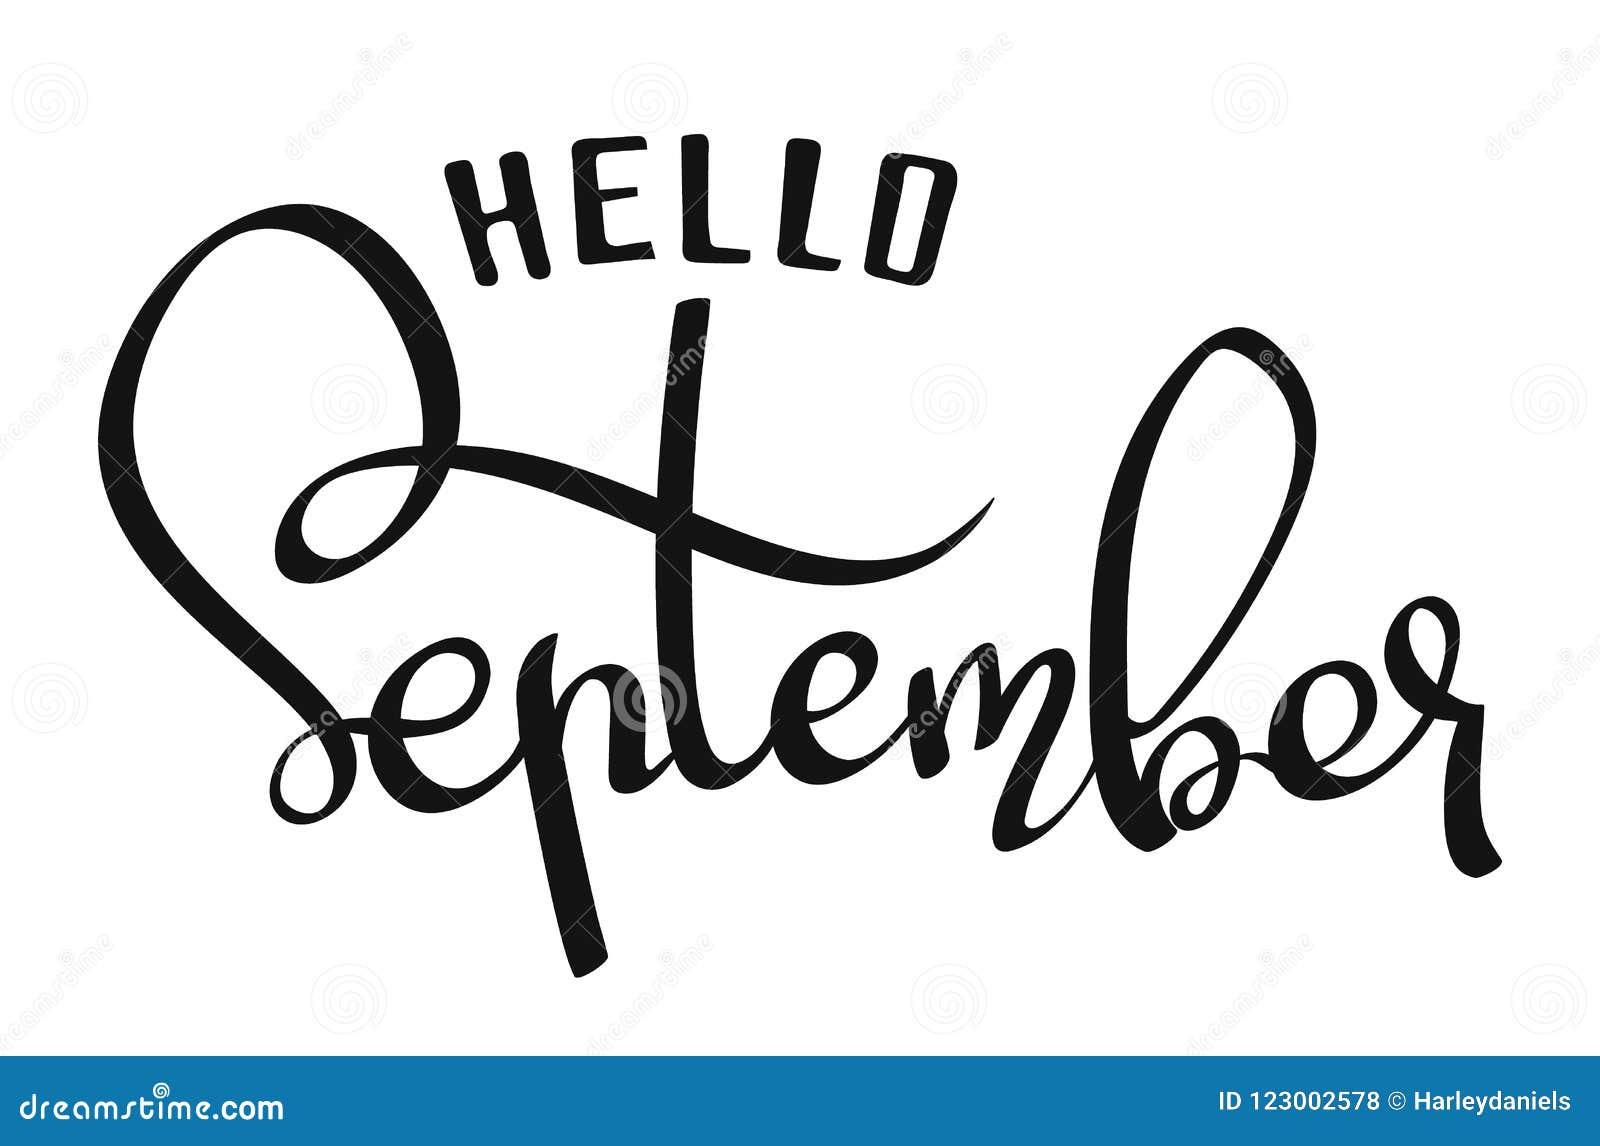 hand written lettering calligraphic phrase hello september vector illustration isolated on white background design for greeting card poster banner